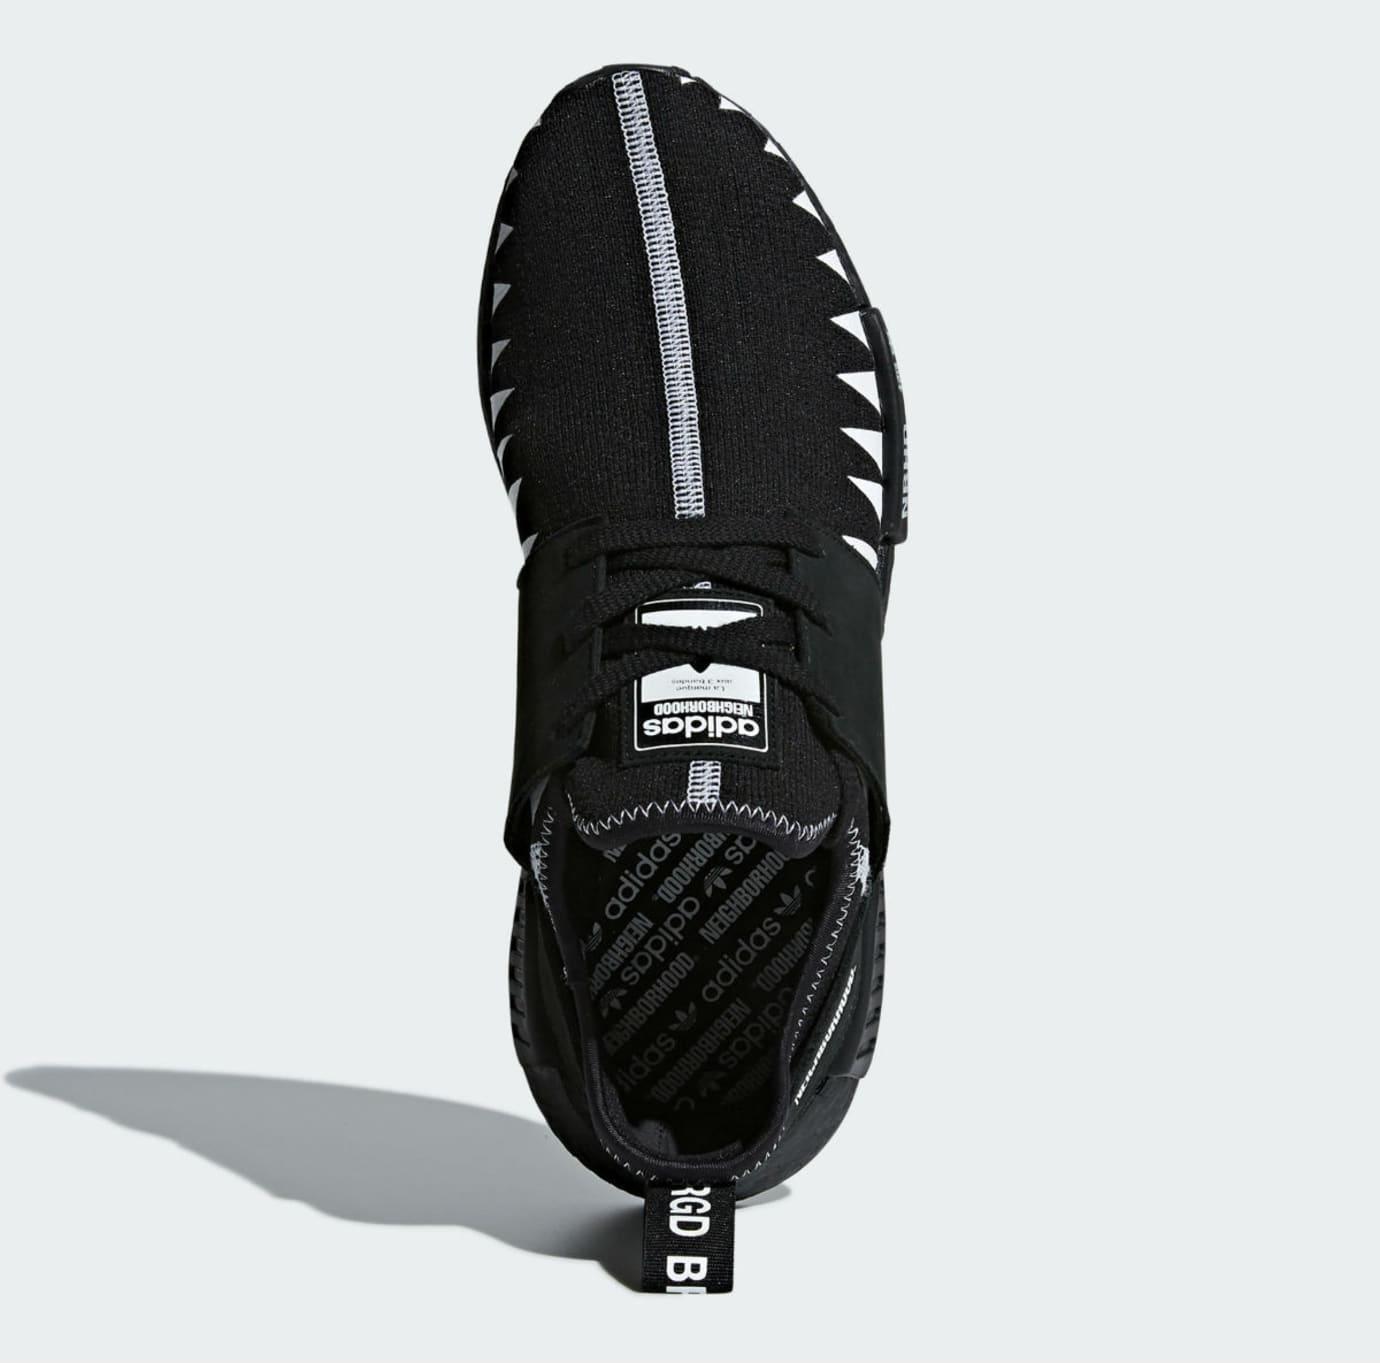 new arrival 081a7 d1e14 Neighborhood x Adidas NMD R1 Release Date DA8835 | Sole ...